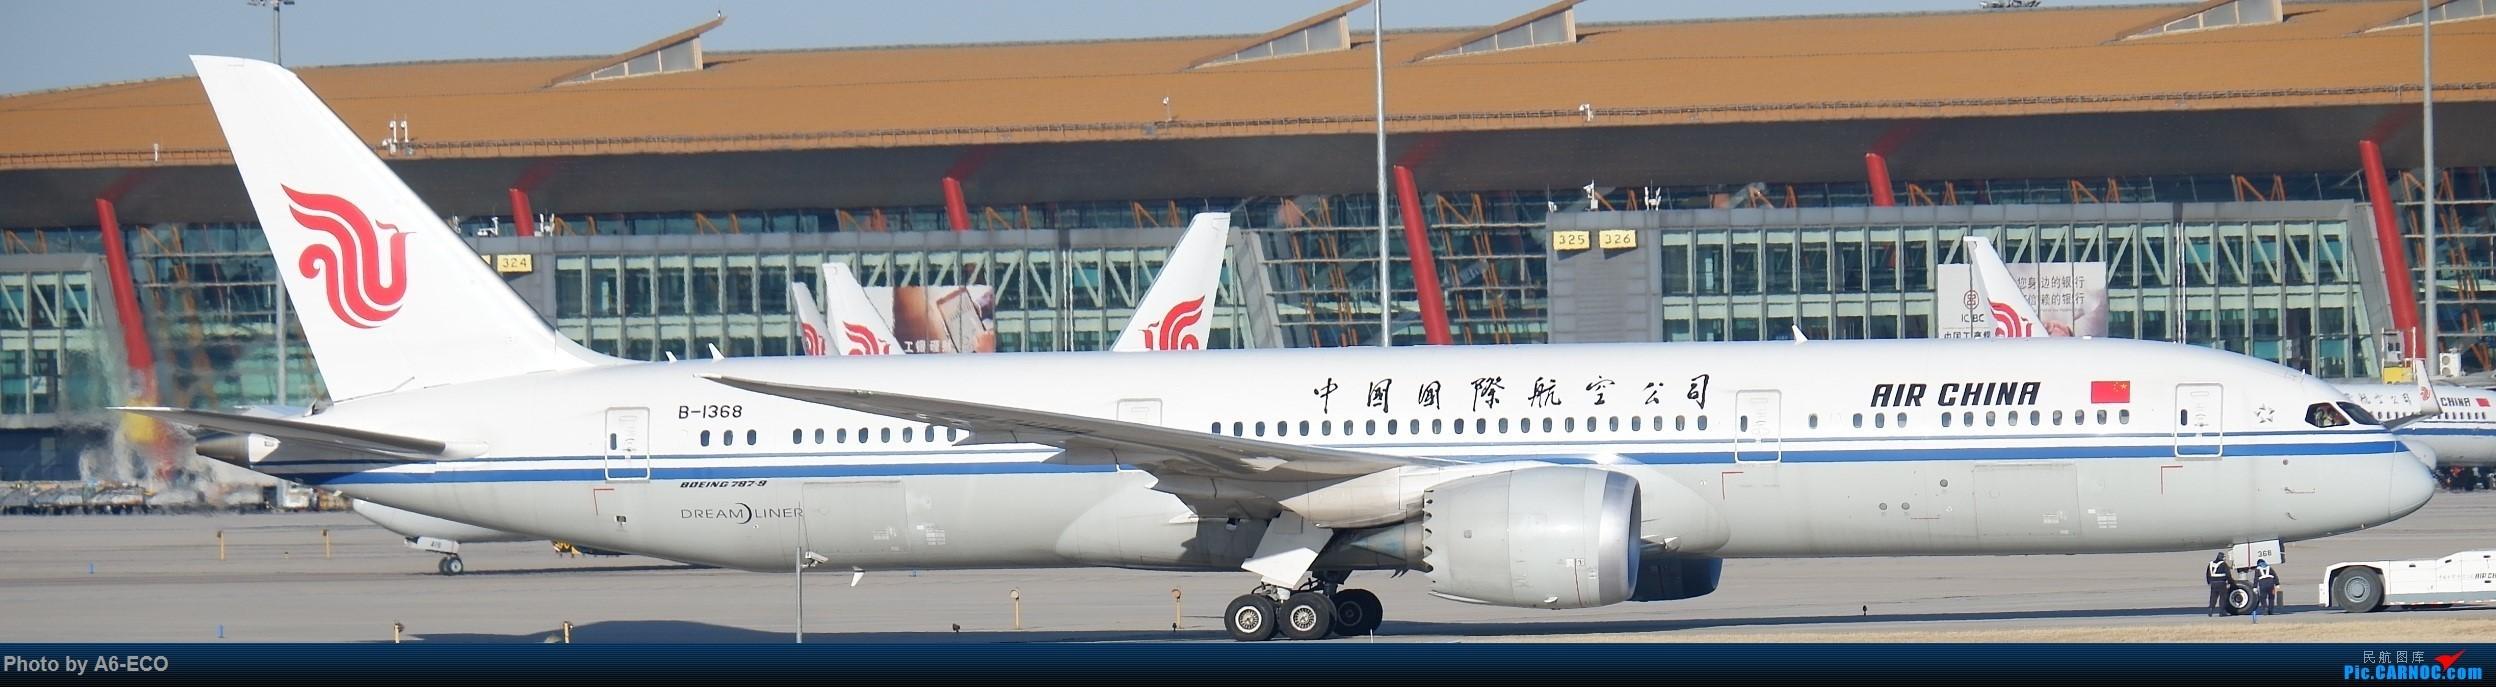 Re:[原创]boeing787's around the world (787九周年纪念) BOEING 787-9 B-1368 中国北京首都国际机场